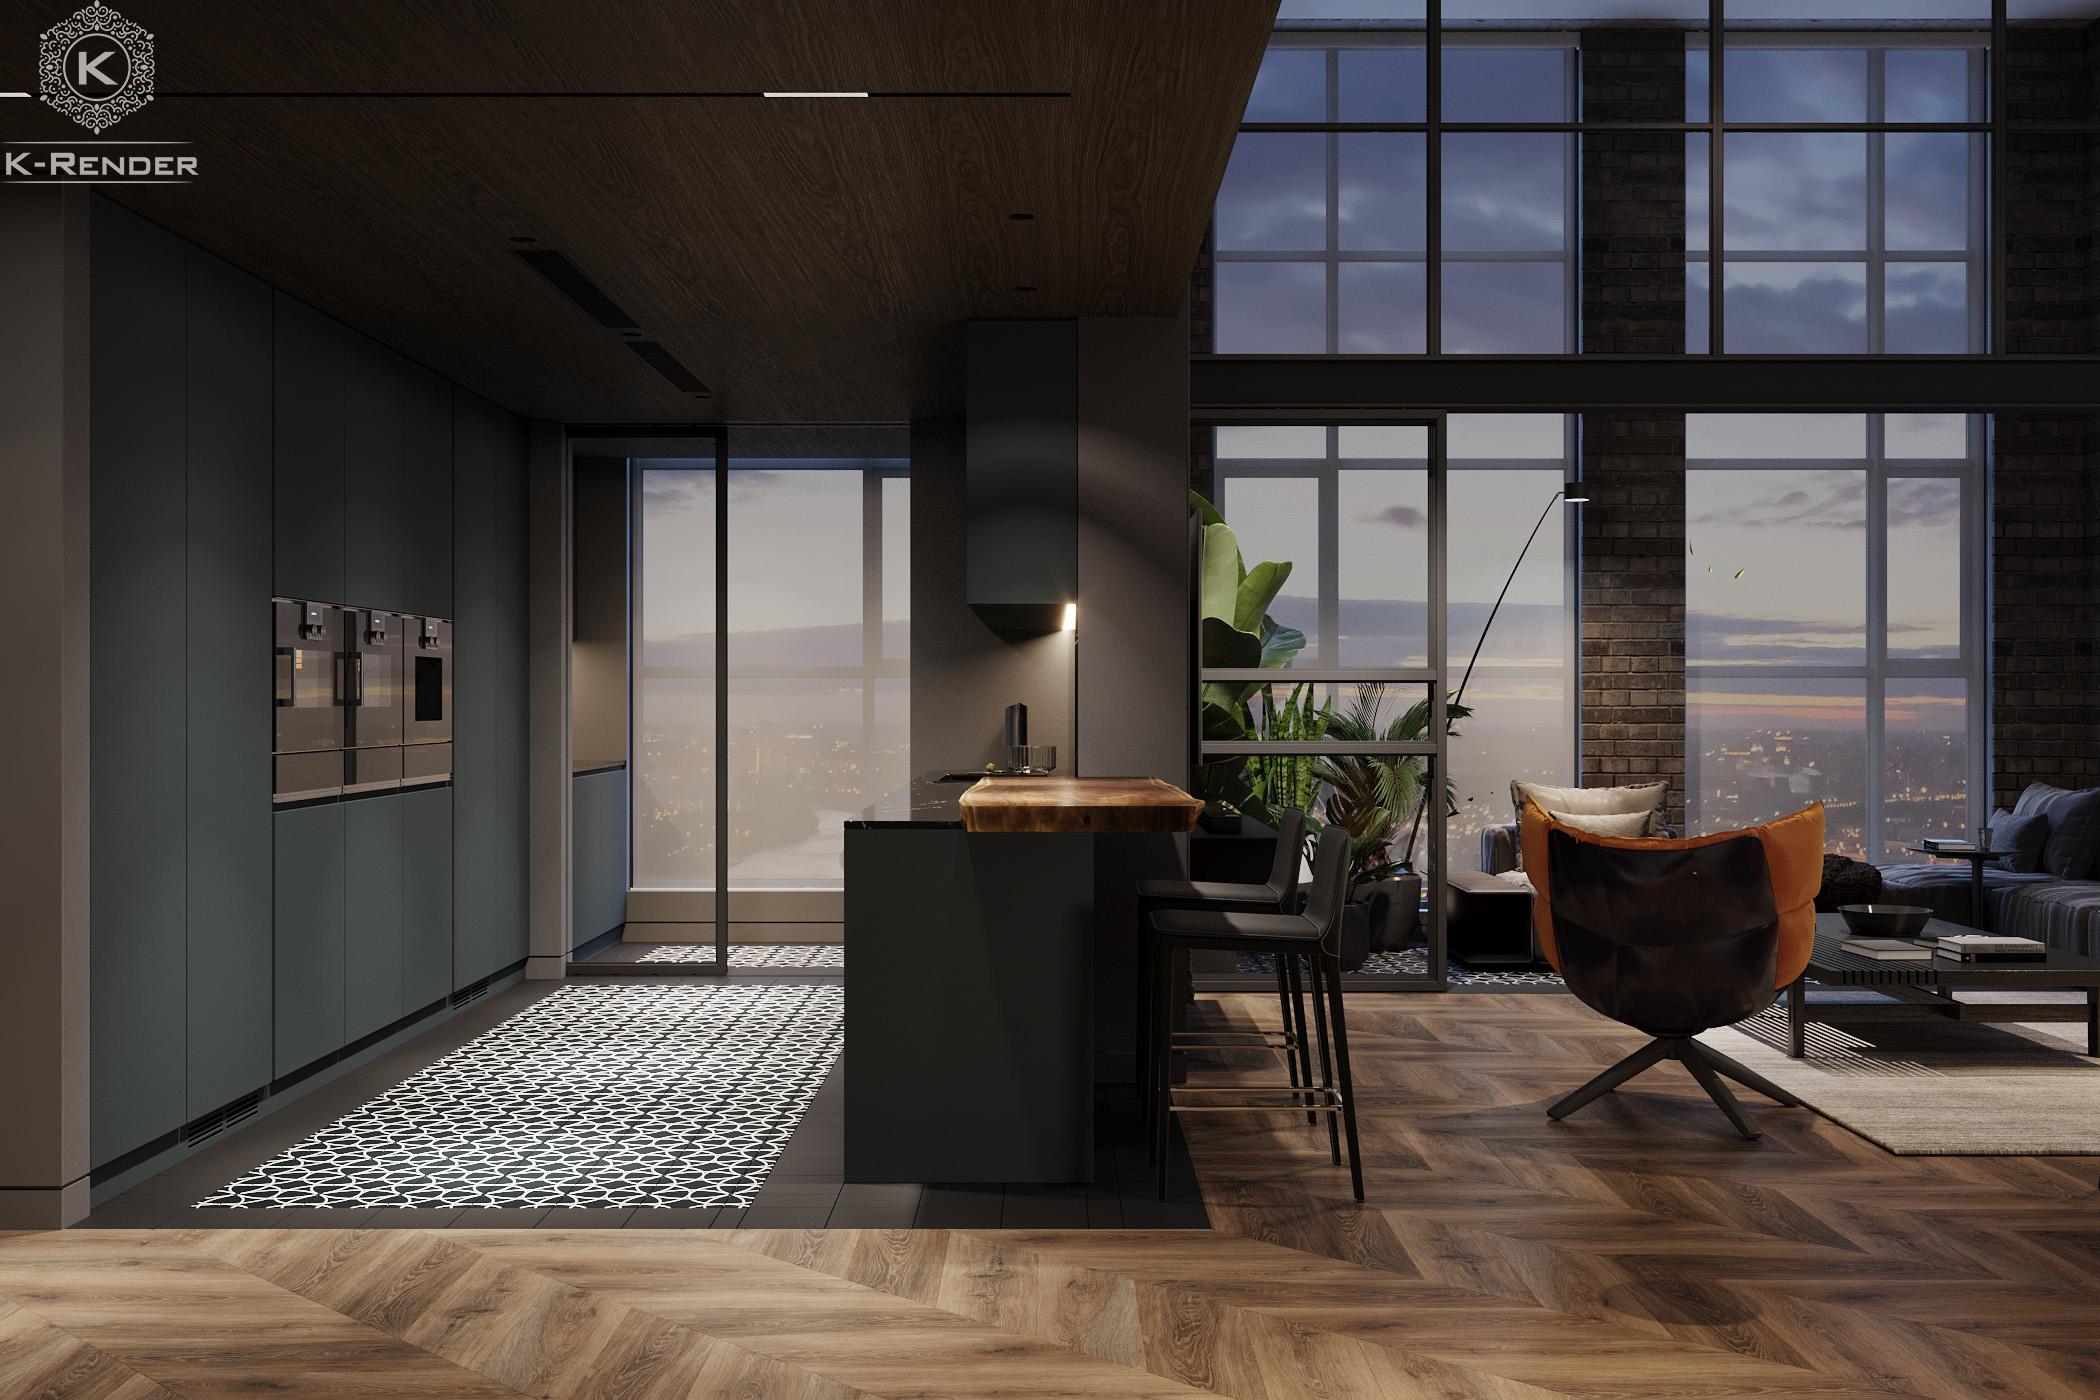 sunshine-apartment-k-render-studio-3d-rendering-studio-7